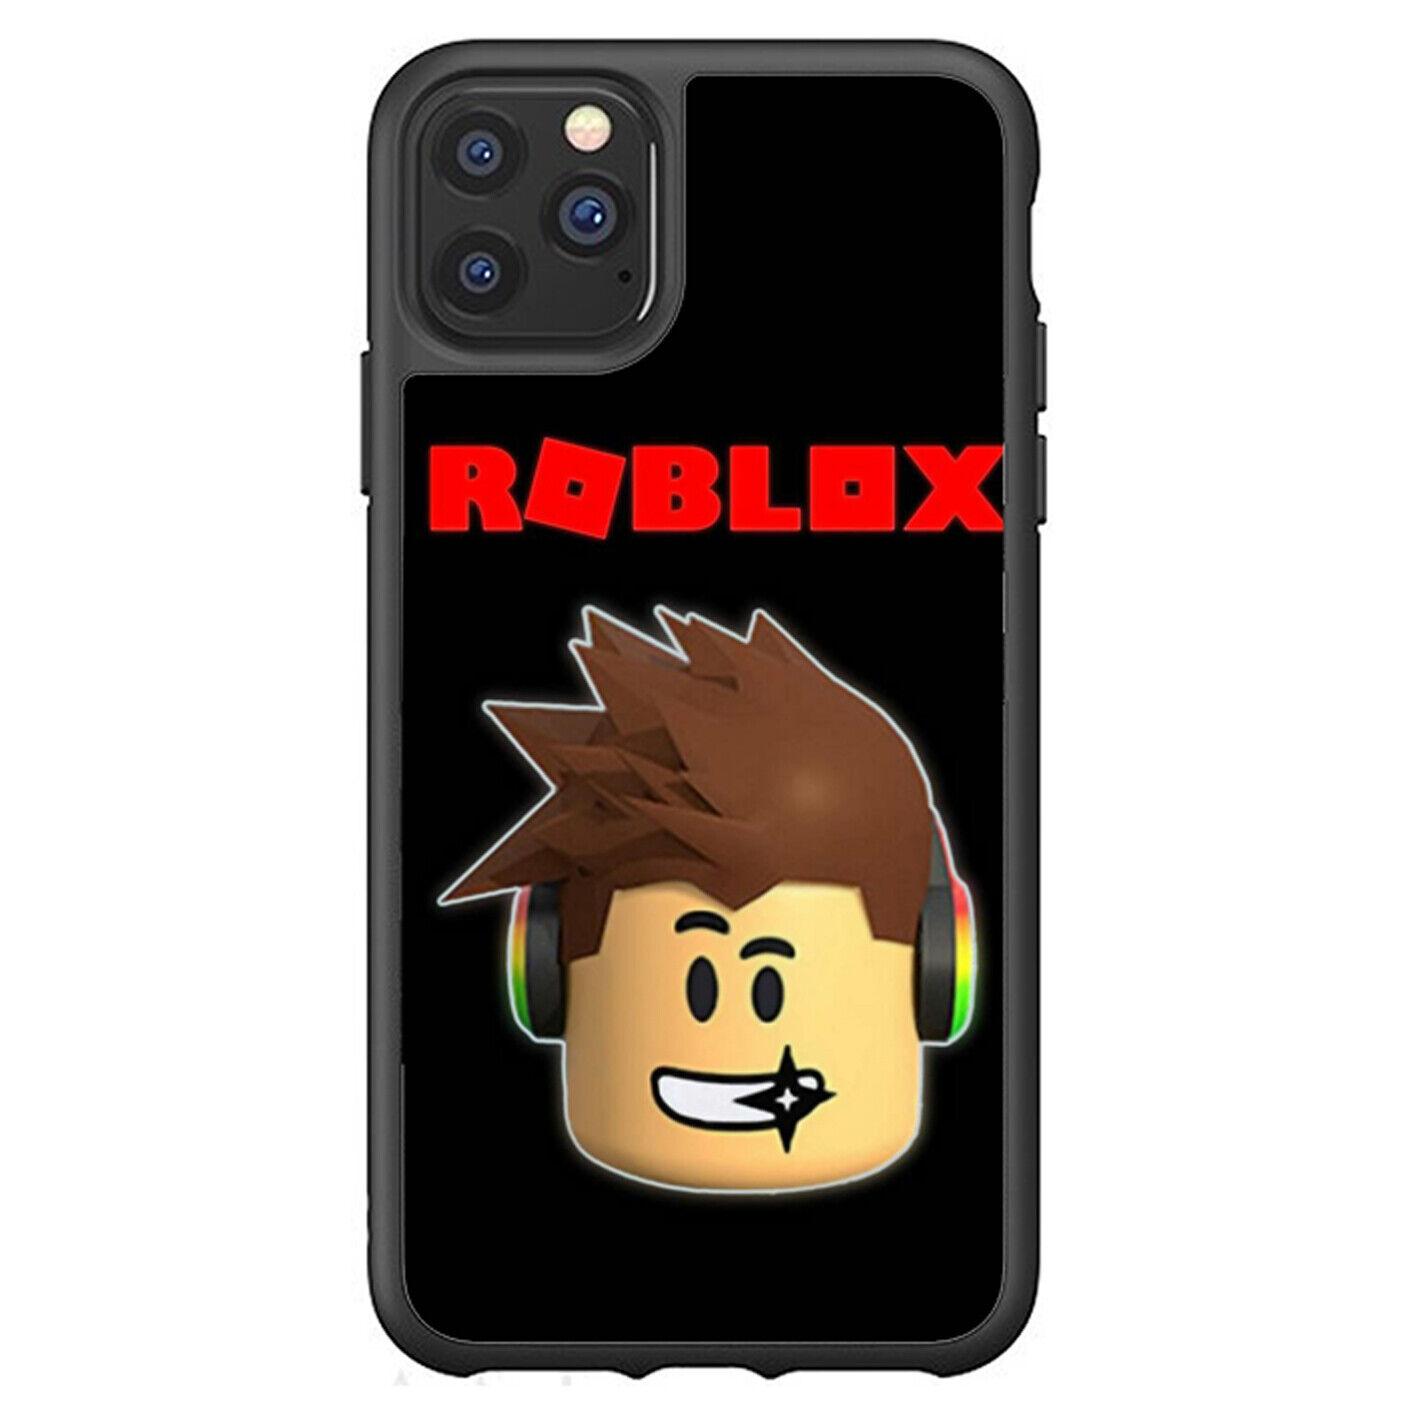 Roblox 003 Case Phone Case For Iphone Samsung Lg Google Ipod Ebay